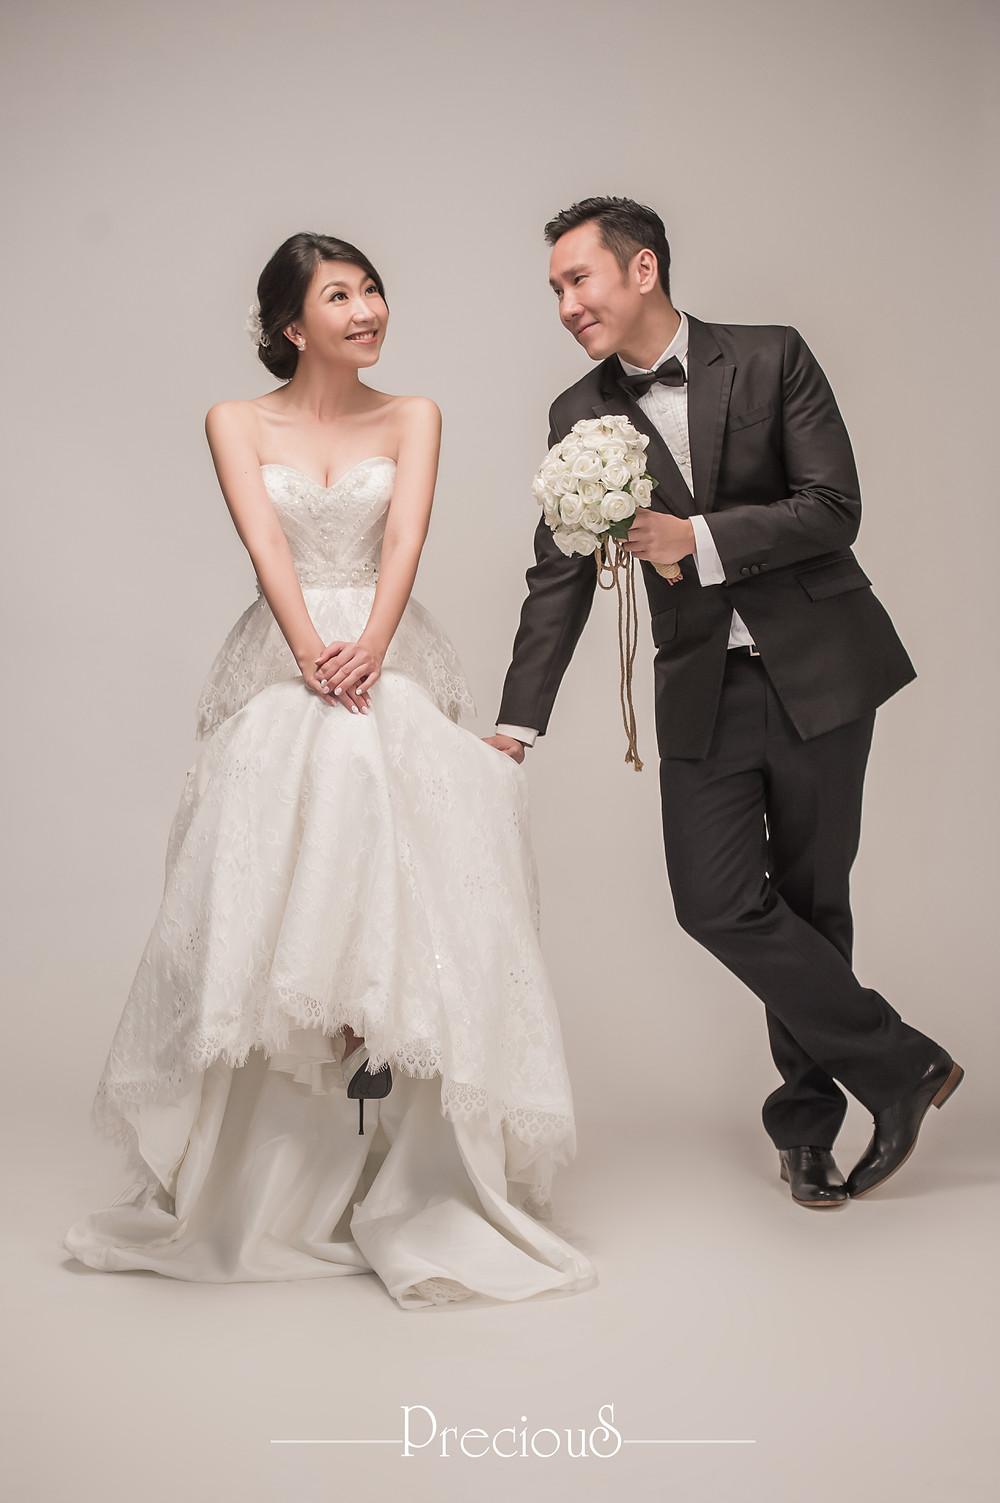 Precious Wedding | Malaysia Celebrity Bride Astro Hui Mei